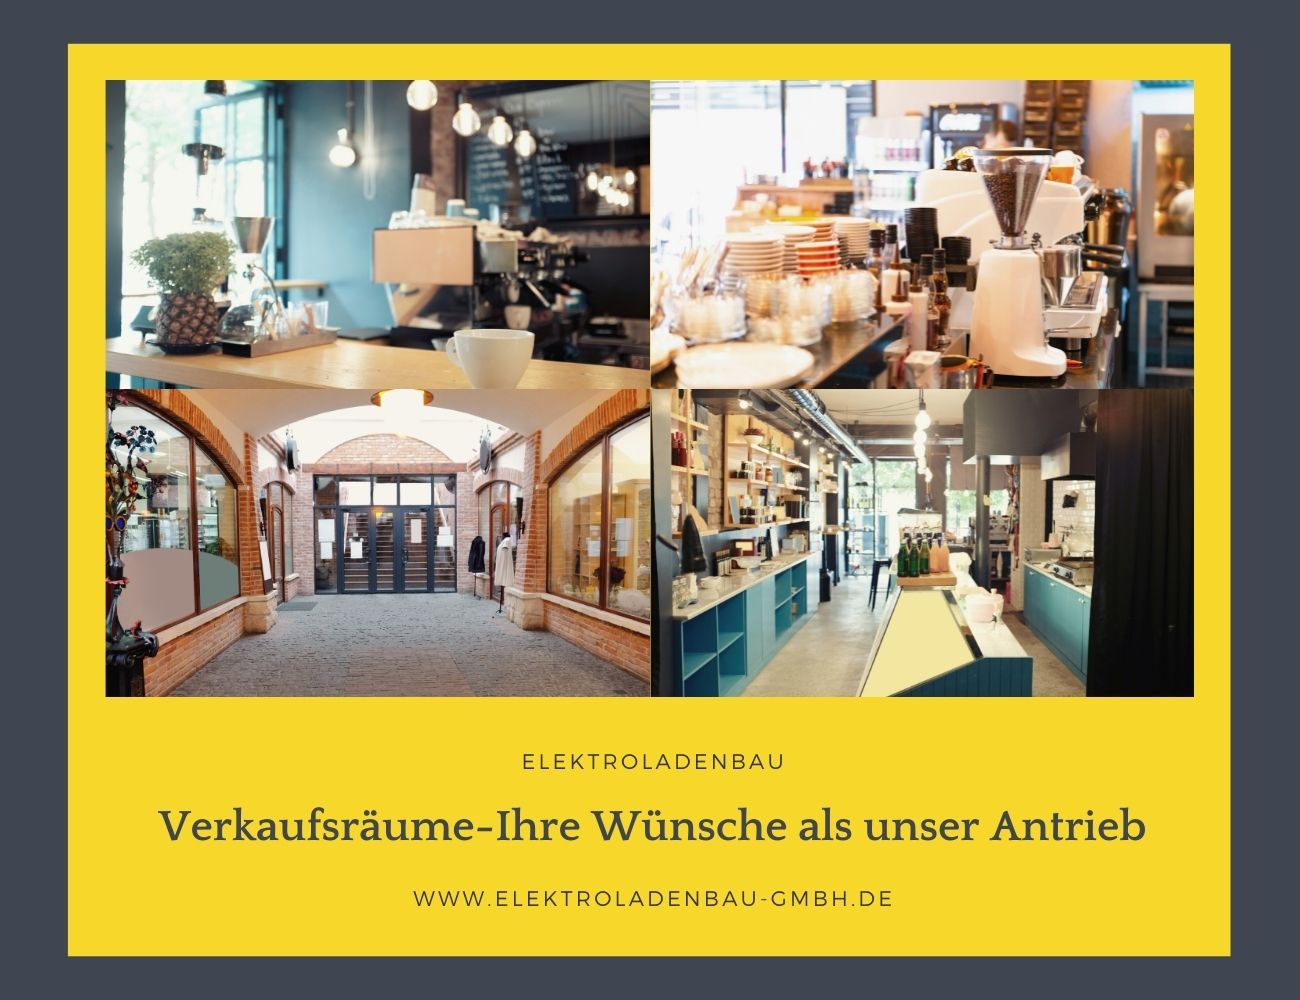 E.L.B. Elektroladenbau Verkaufsräume Solingen und Düsseldorf